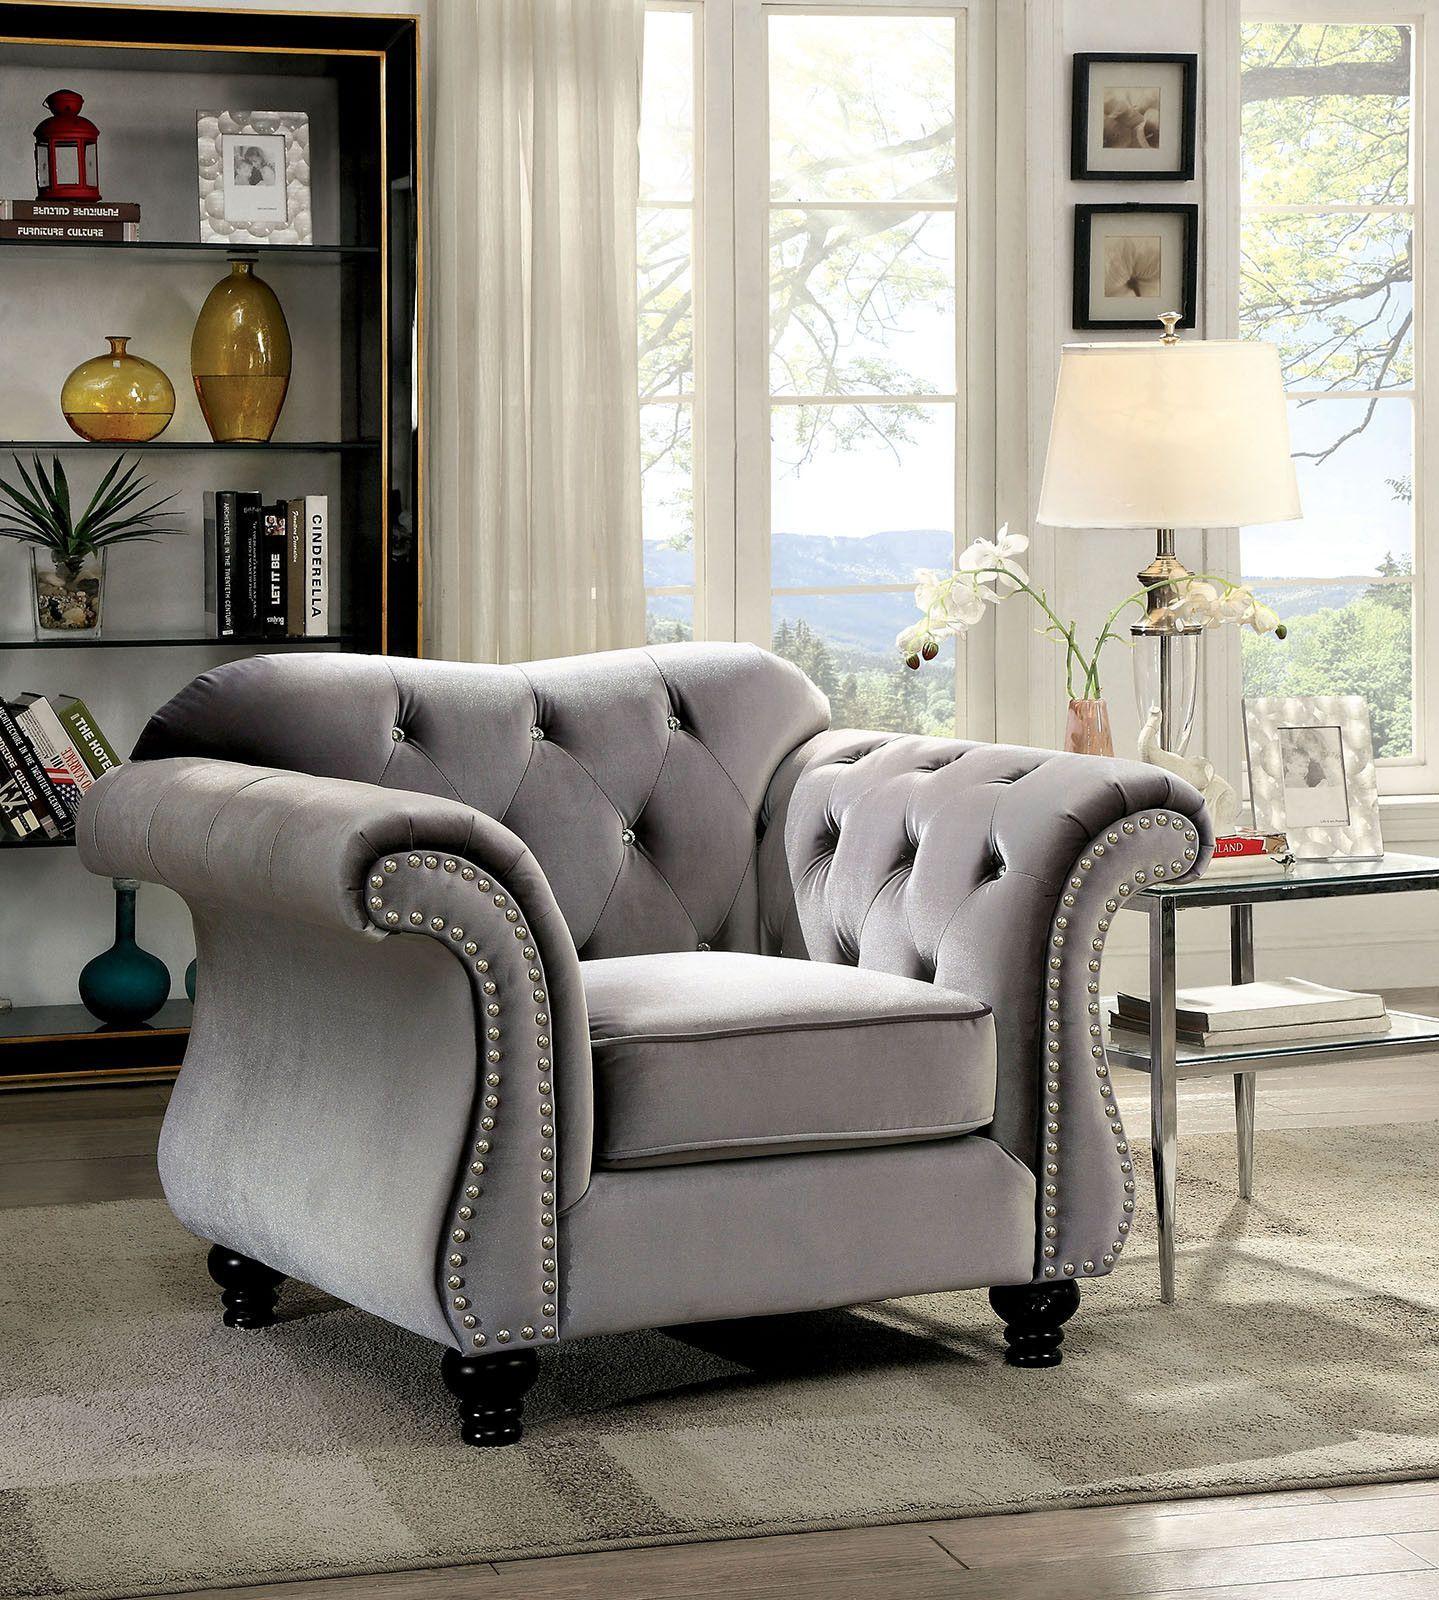 Jolanda Chair CM6159GY CH Description With the luxurious presence